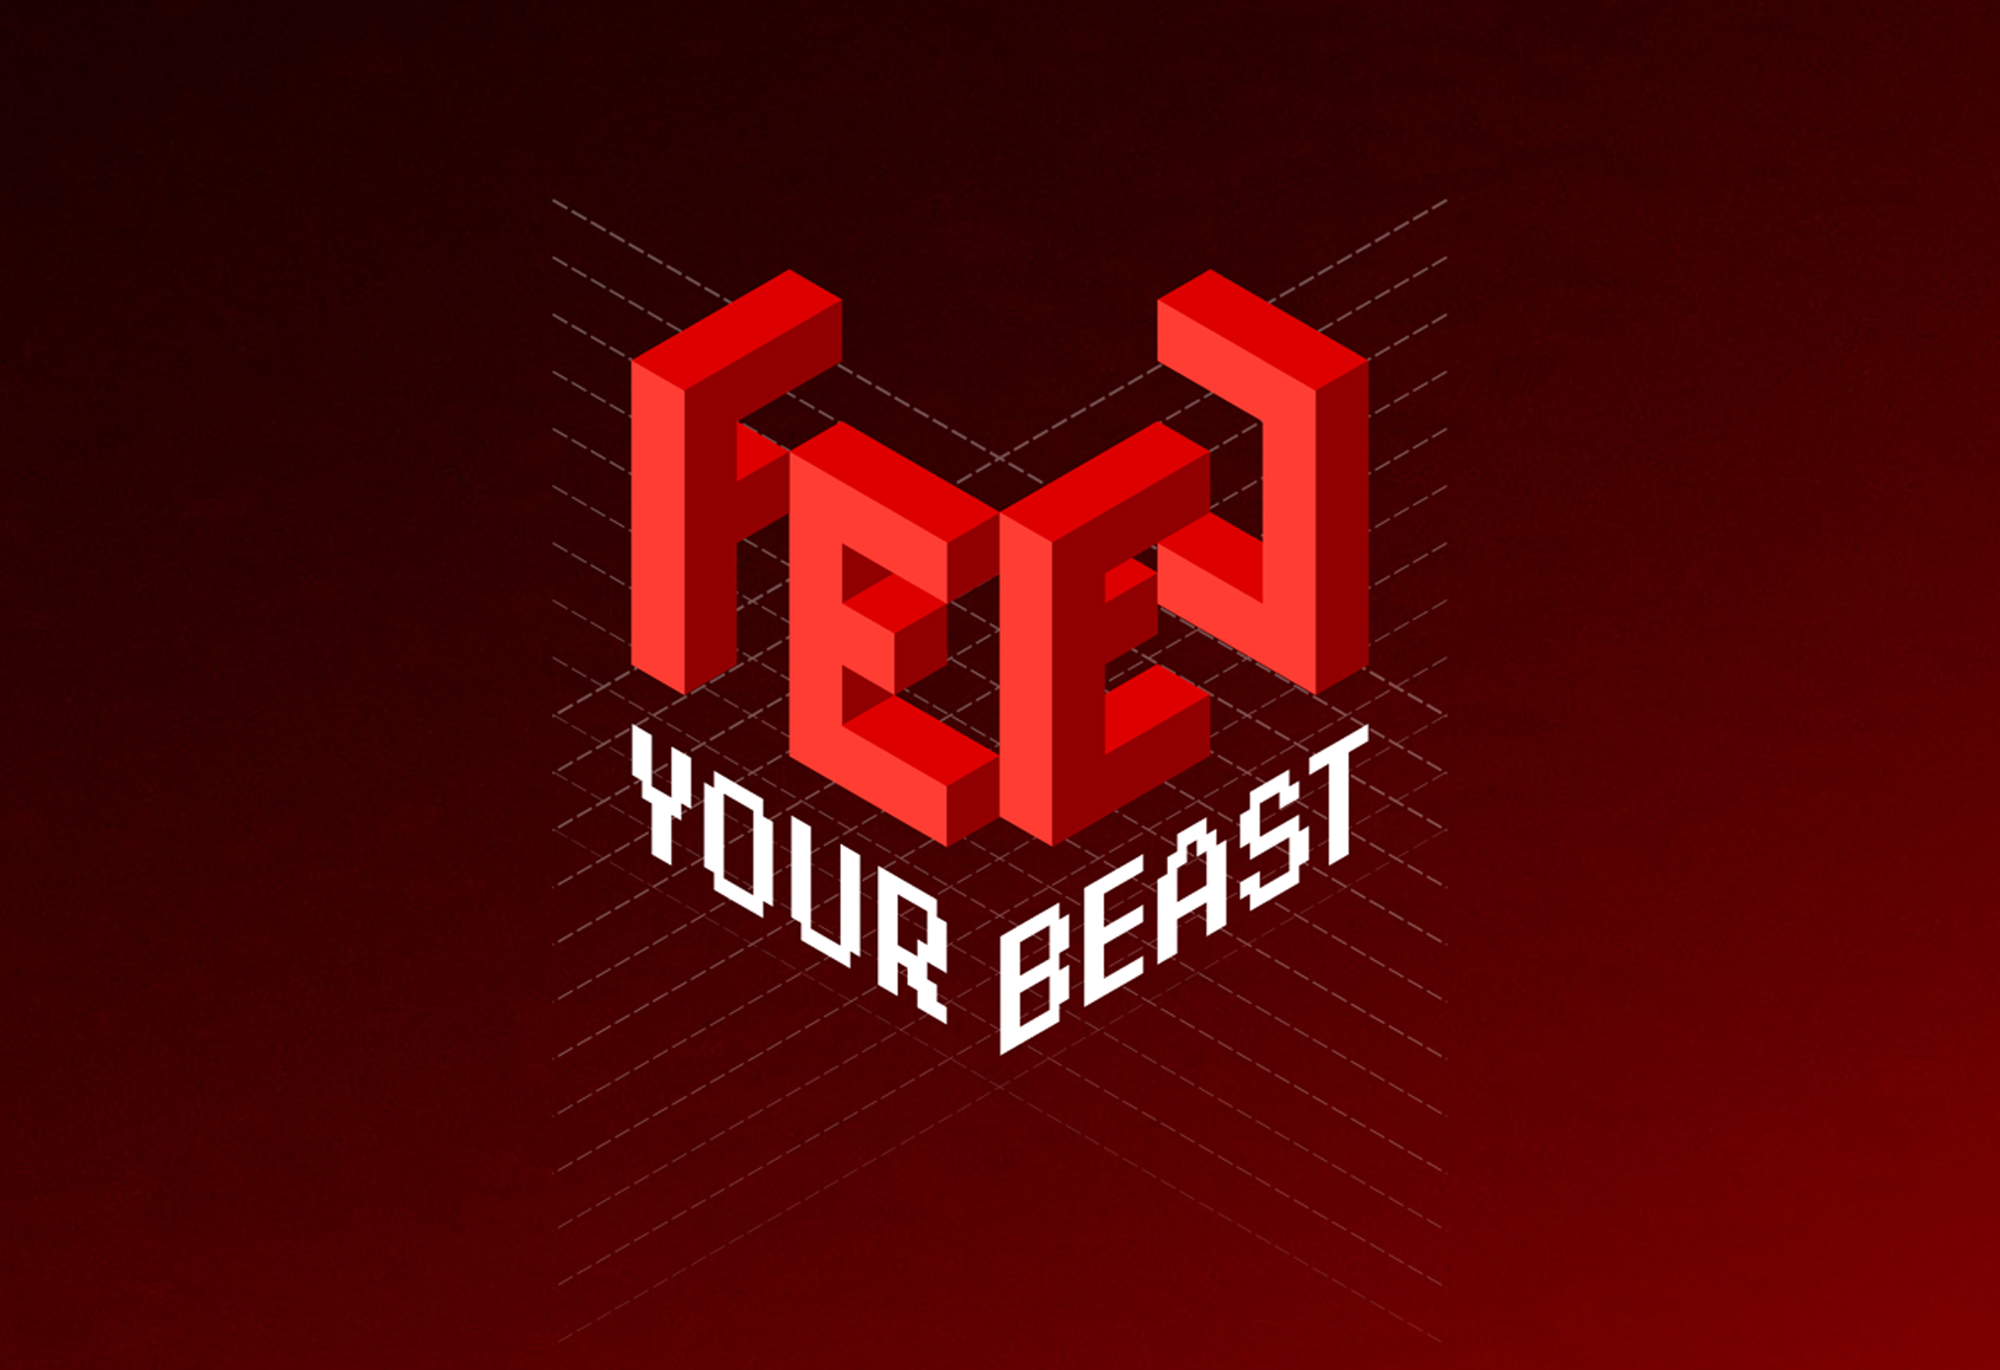 ESPN Feed Your Beast logo